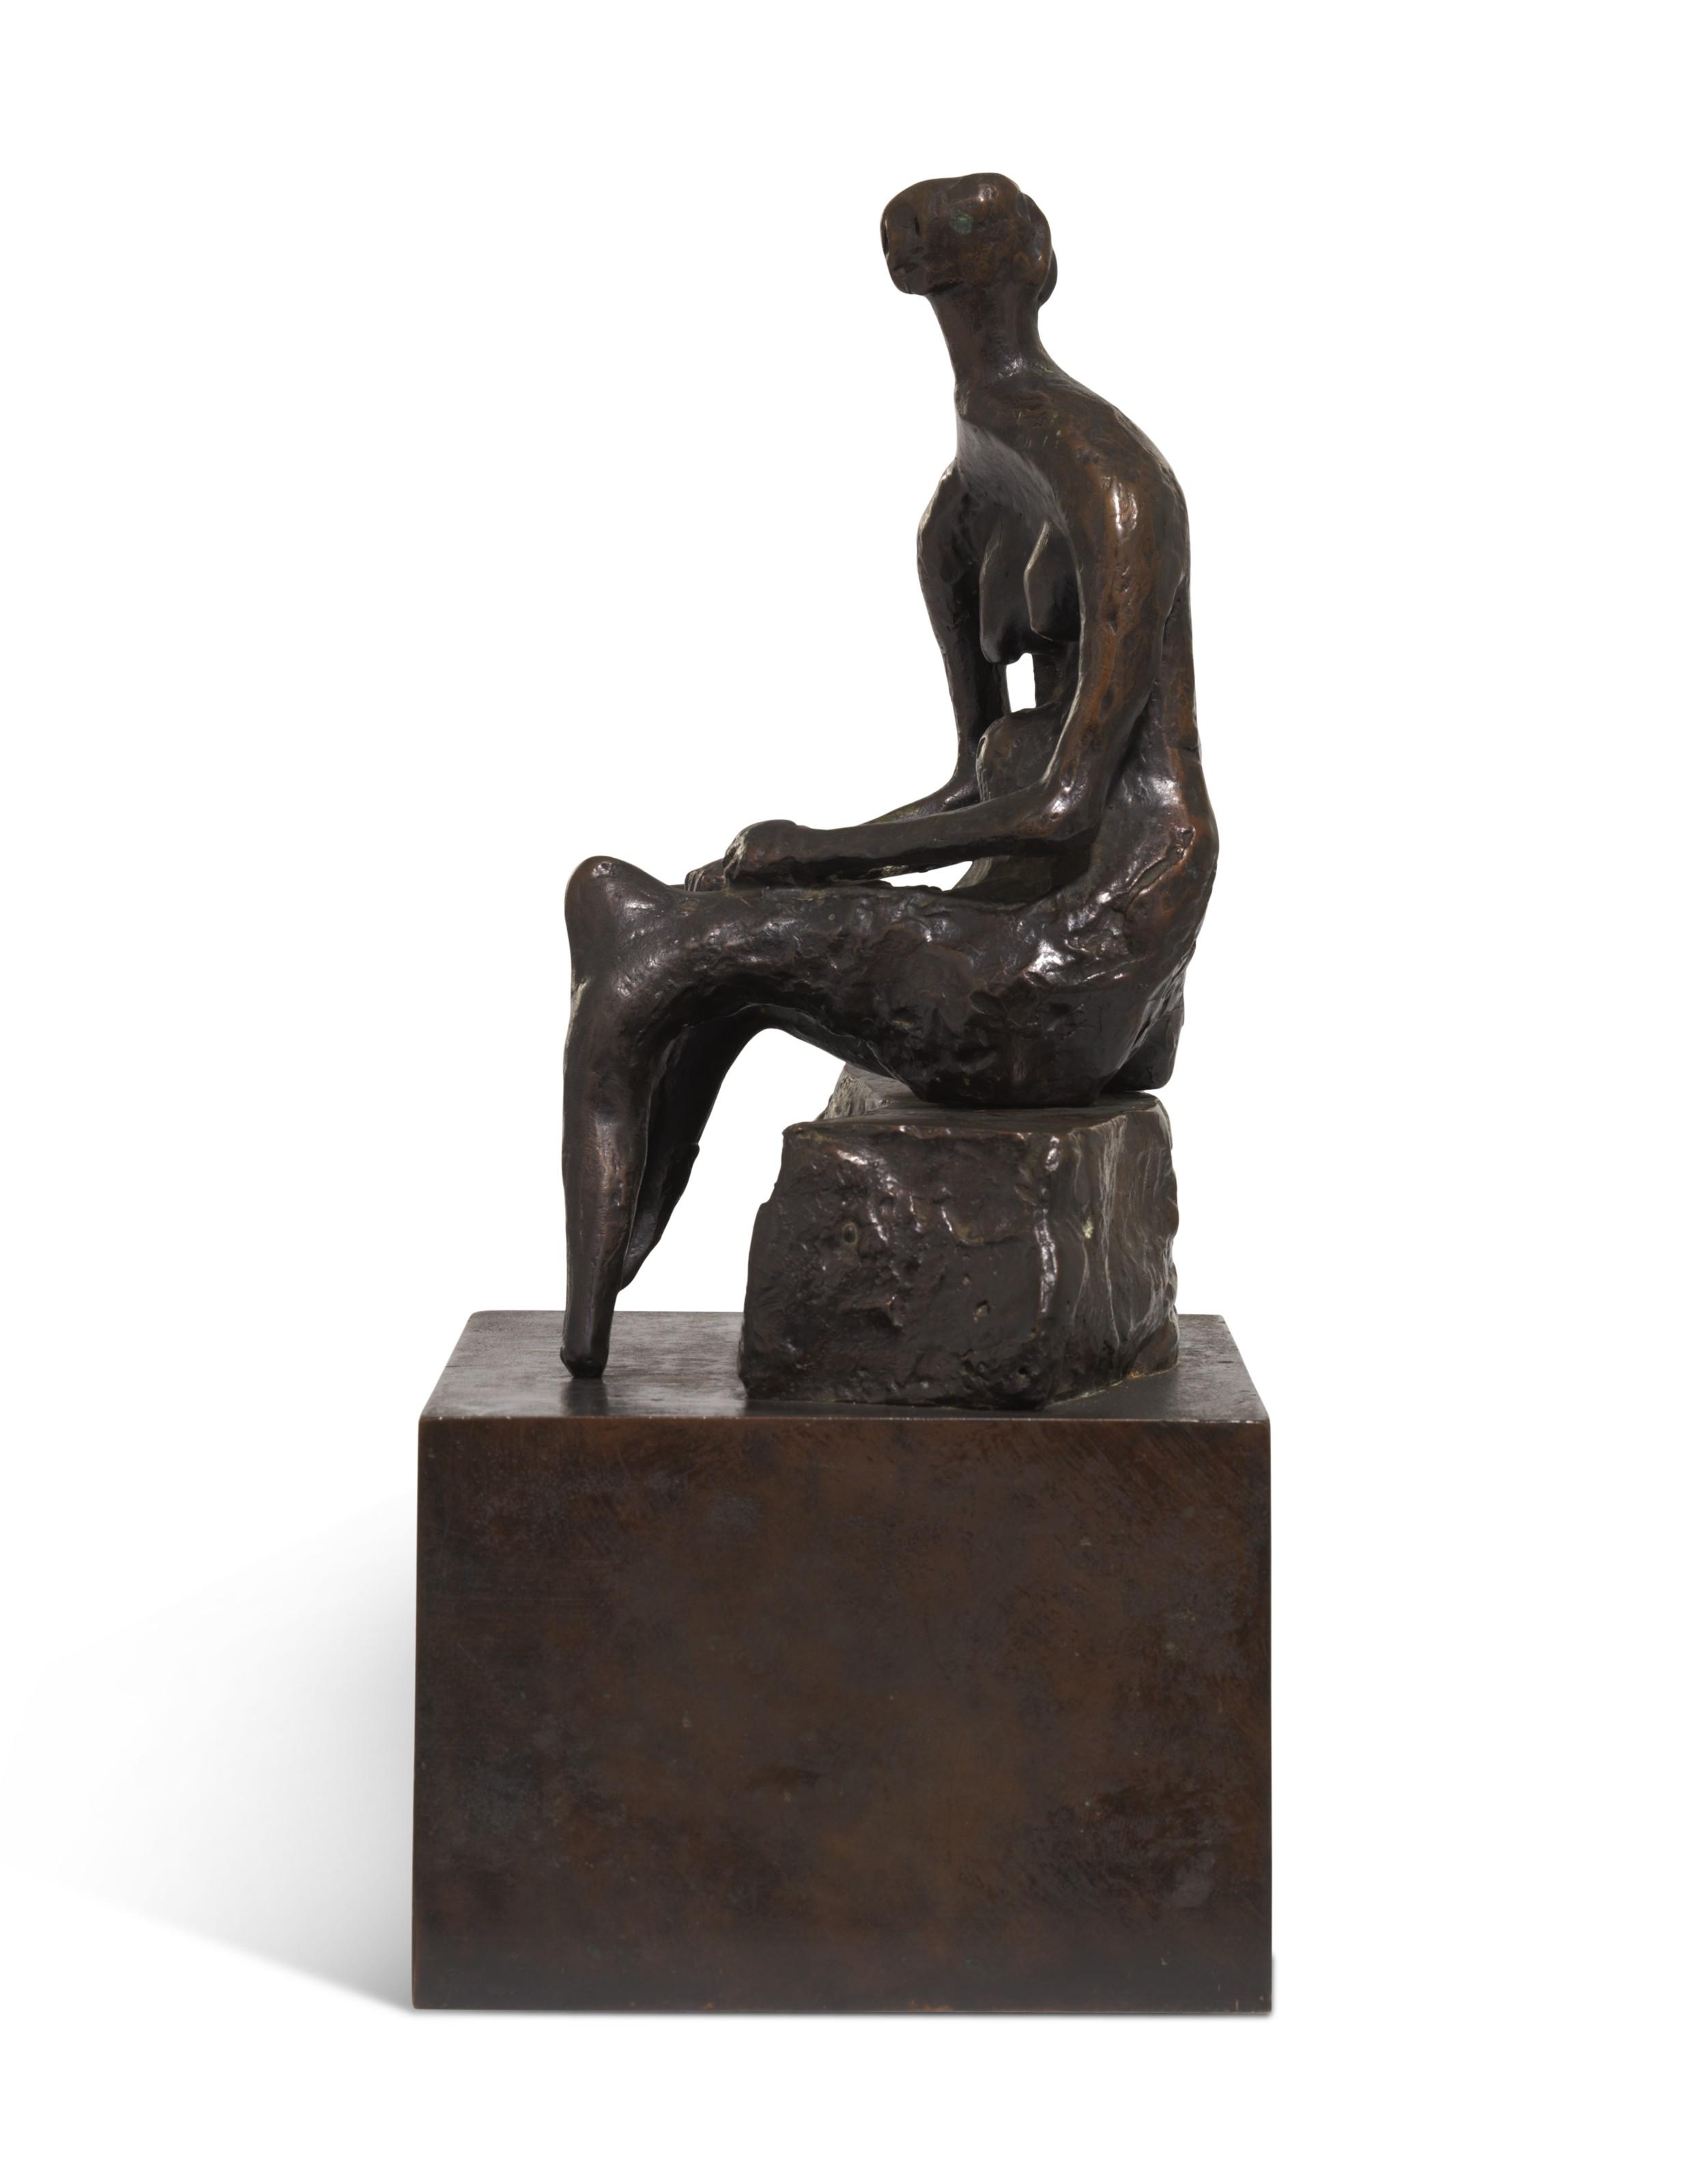 Henry Moore, O.M., C.H., (1898-1986)